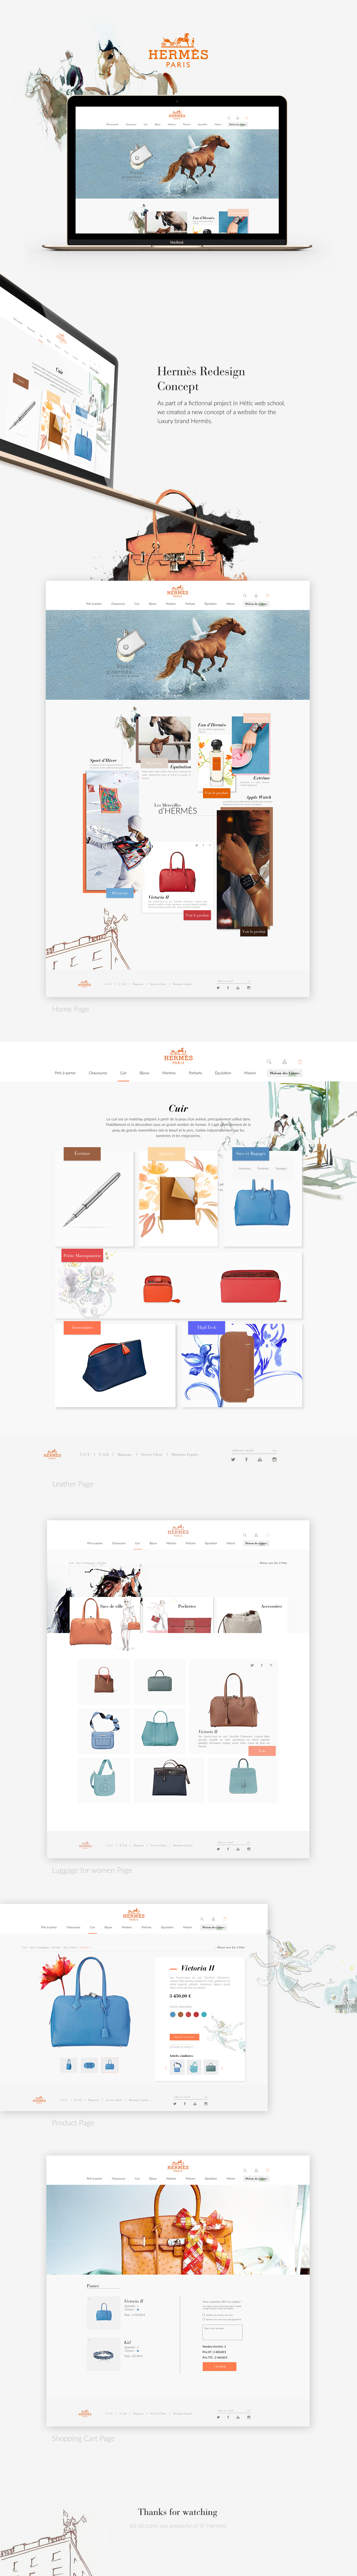 hermes,luxury,Web,redesign